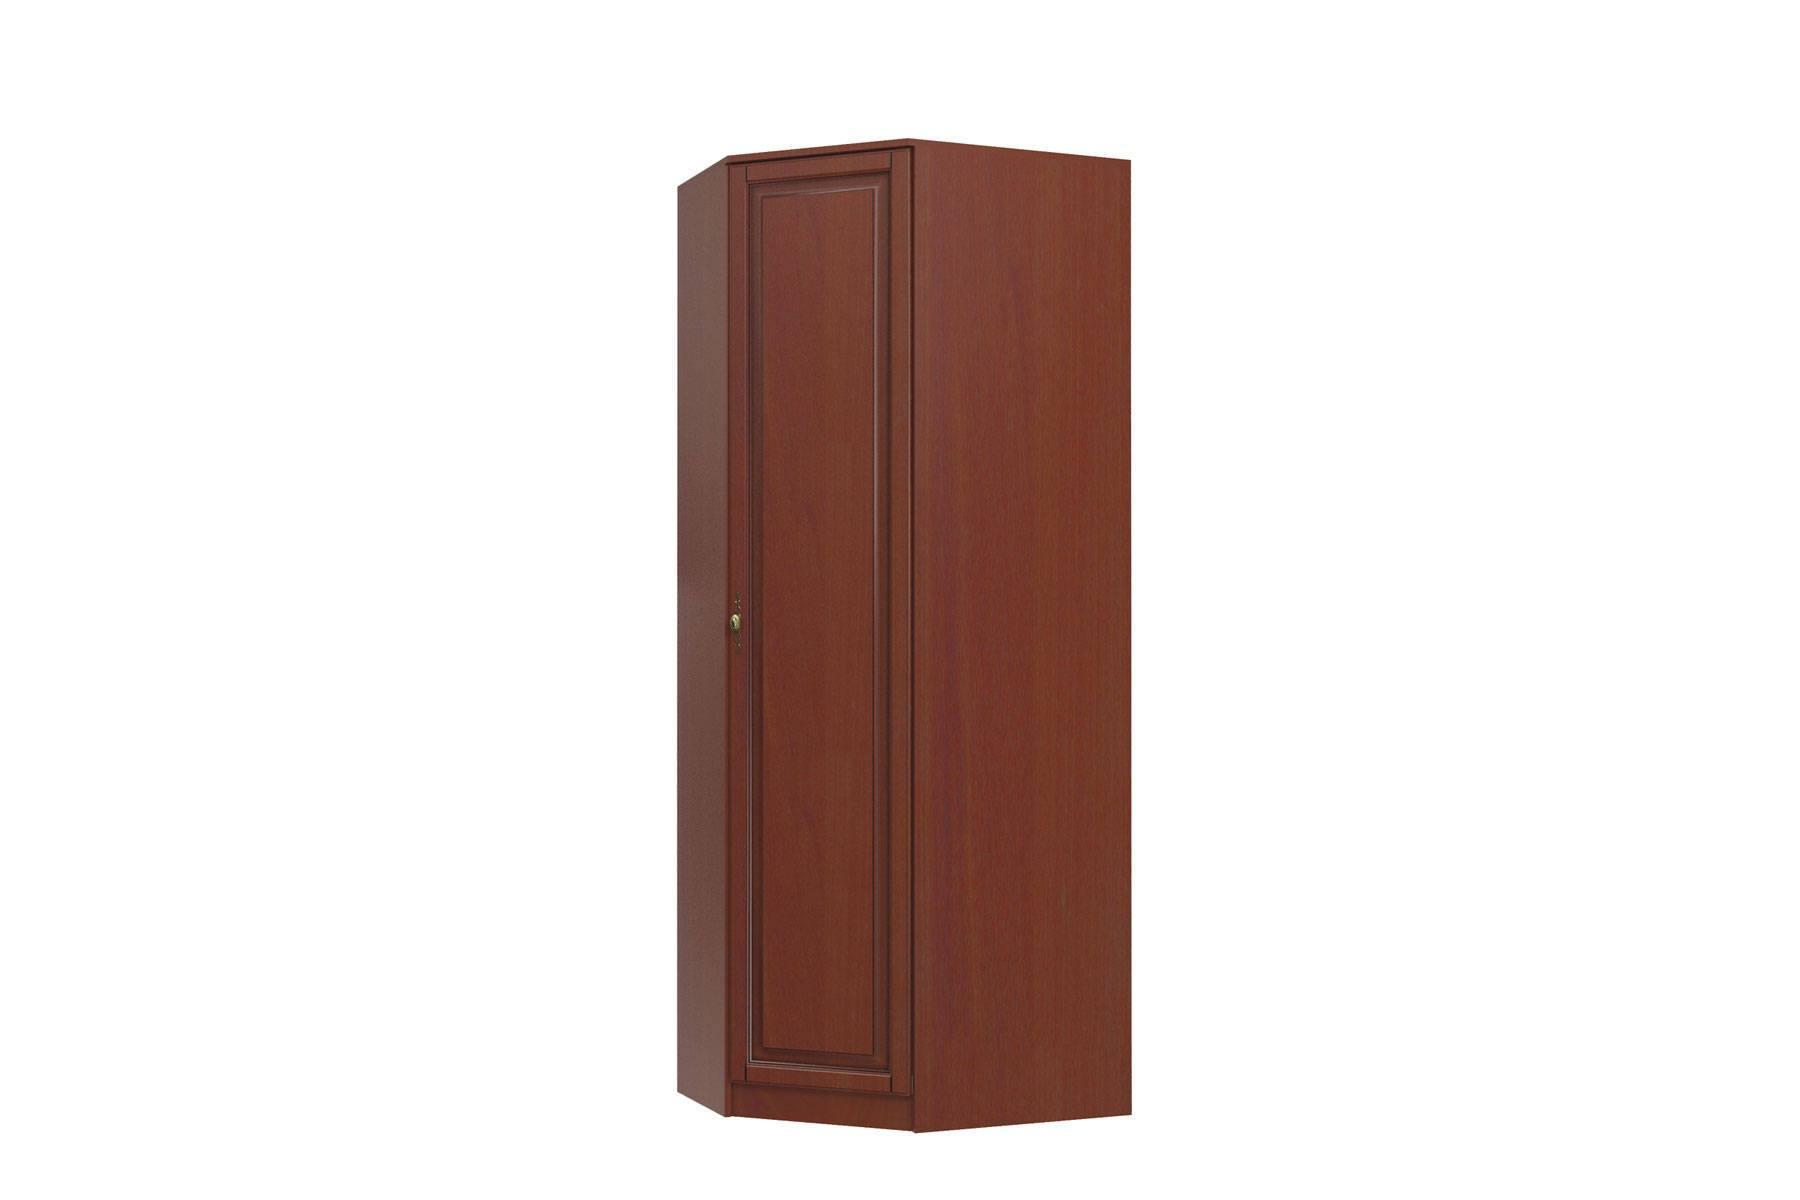 Шкаф угловой правый Влада СТЛ.040.07